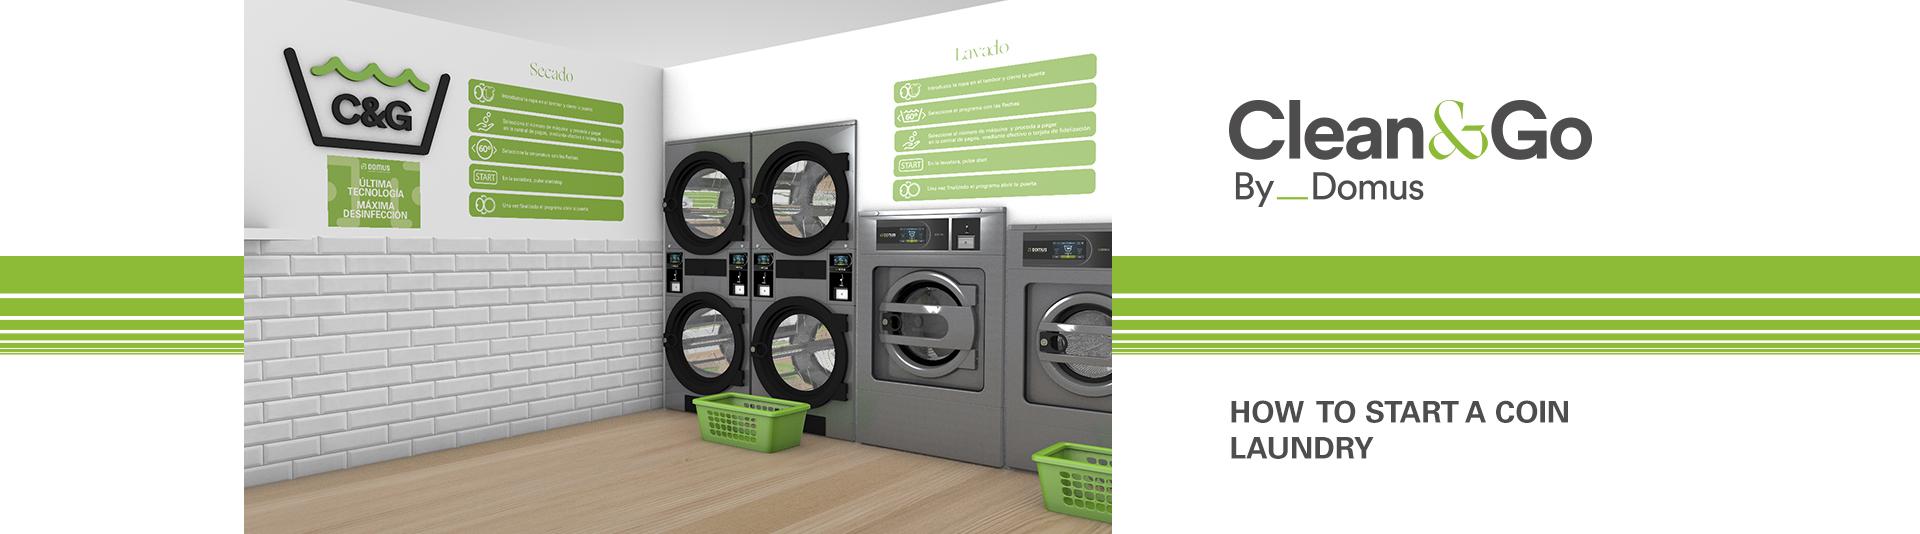 Clean&Go, domus, ขายเครื่องซักผ้าหยอดเหรียญ, เครื่องอบผ้าหยอดเหรียญ, Coin-Op, ร้านซักผ้าหยอดเหรียญ, ร้านอบผ้าหยอดเหรียญ, เครื่องซักผ้า, เครื่องอบผ้า